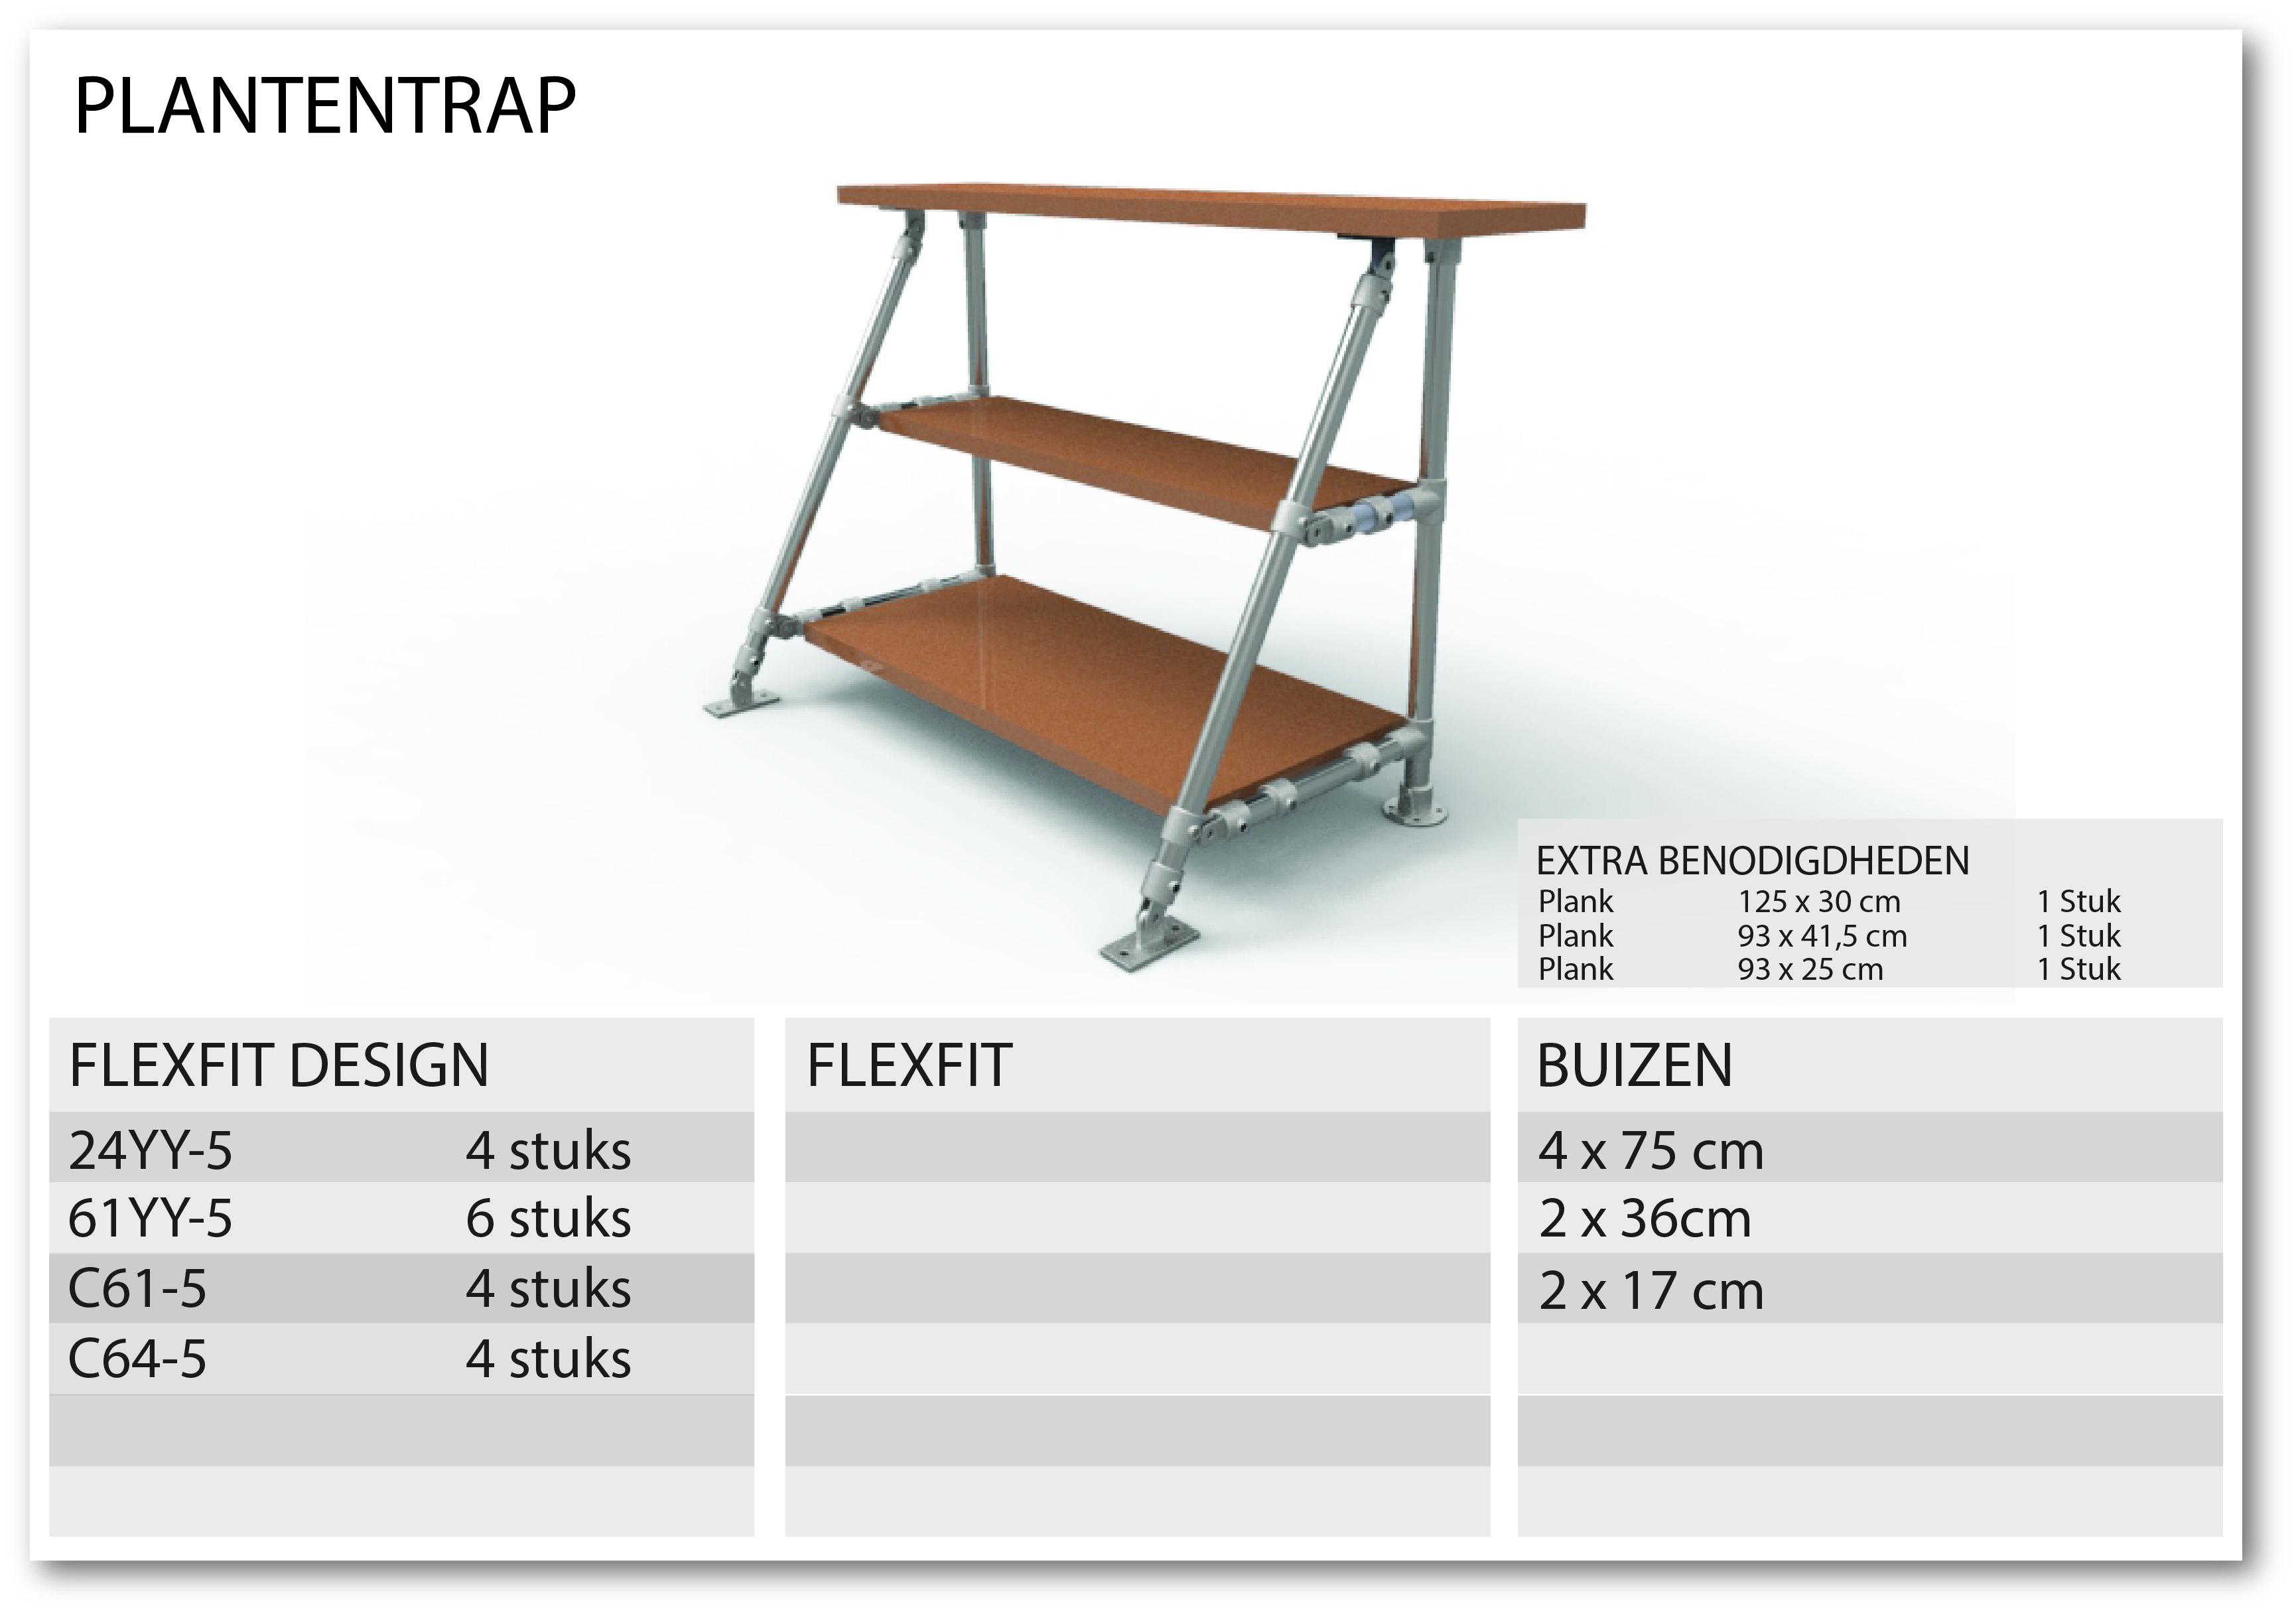 Ontwerpen flexfit - Trap ontwerpen ...